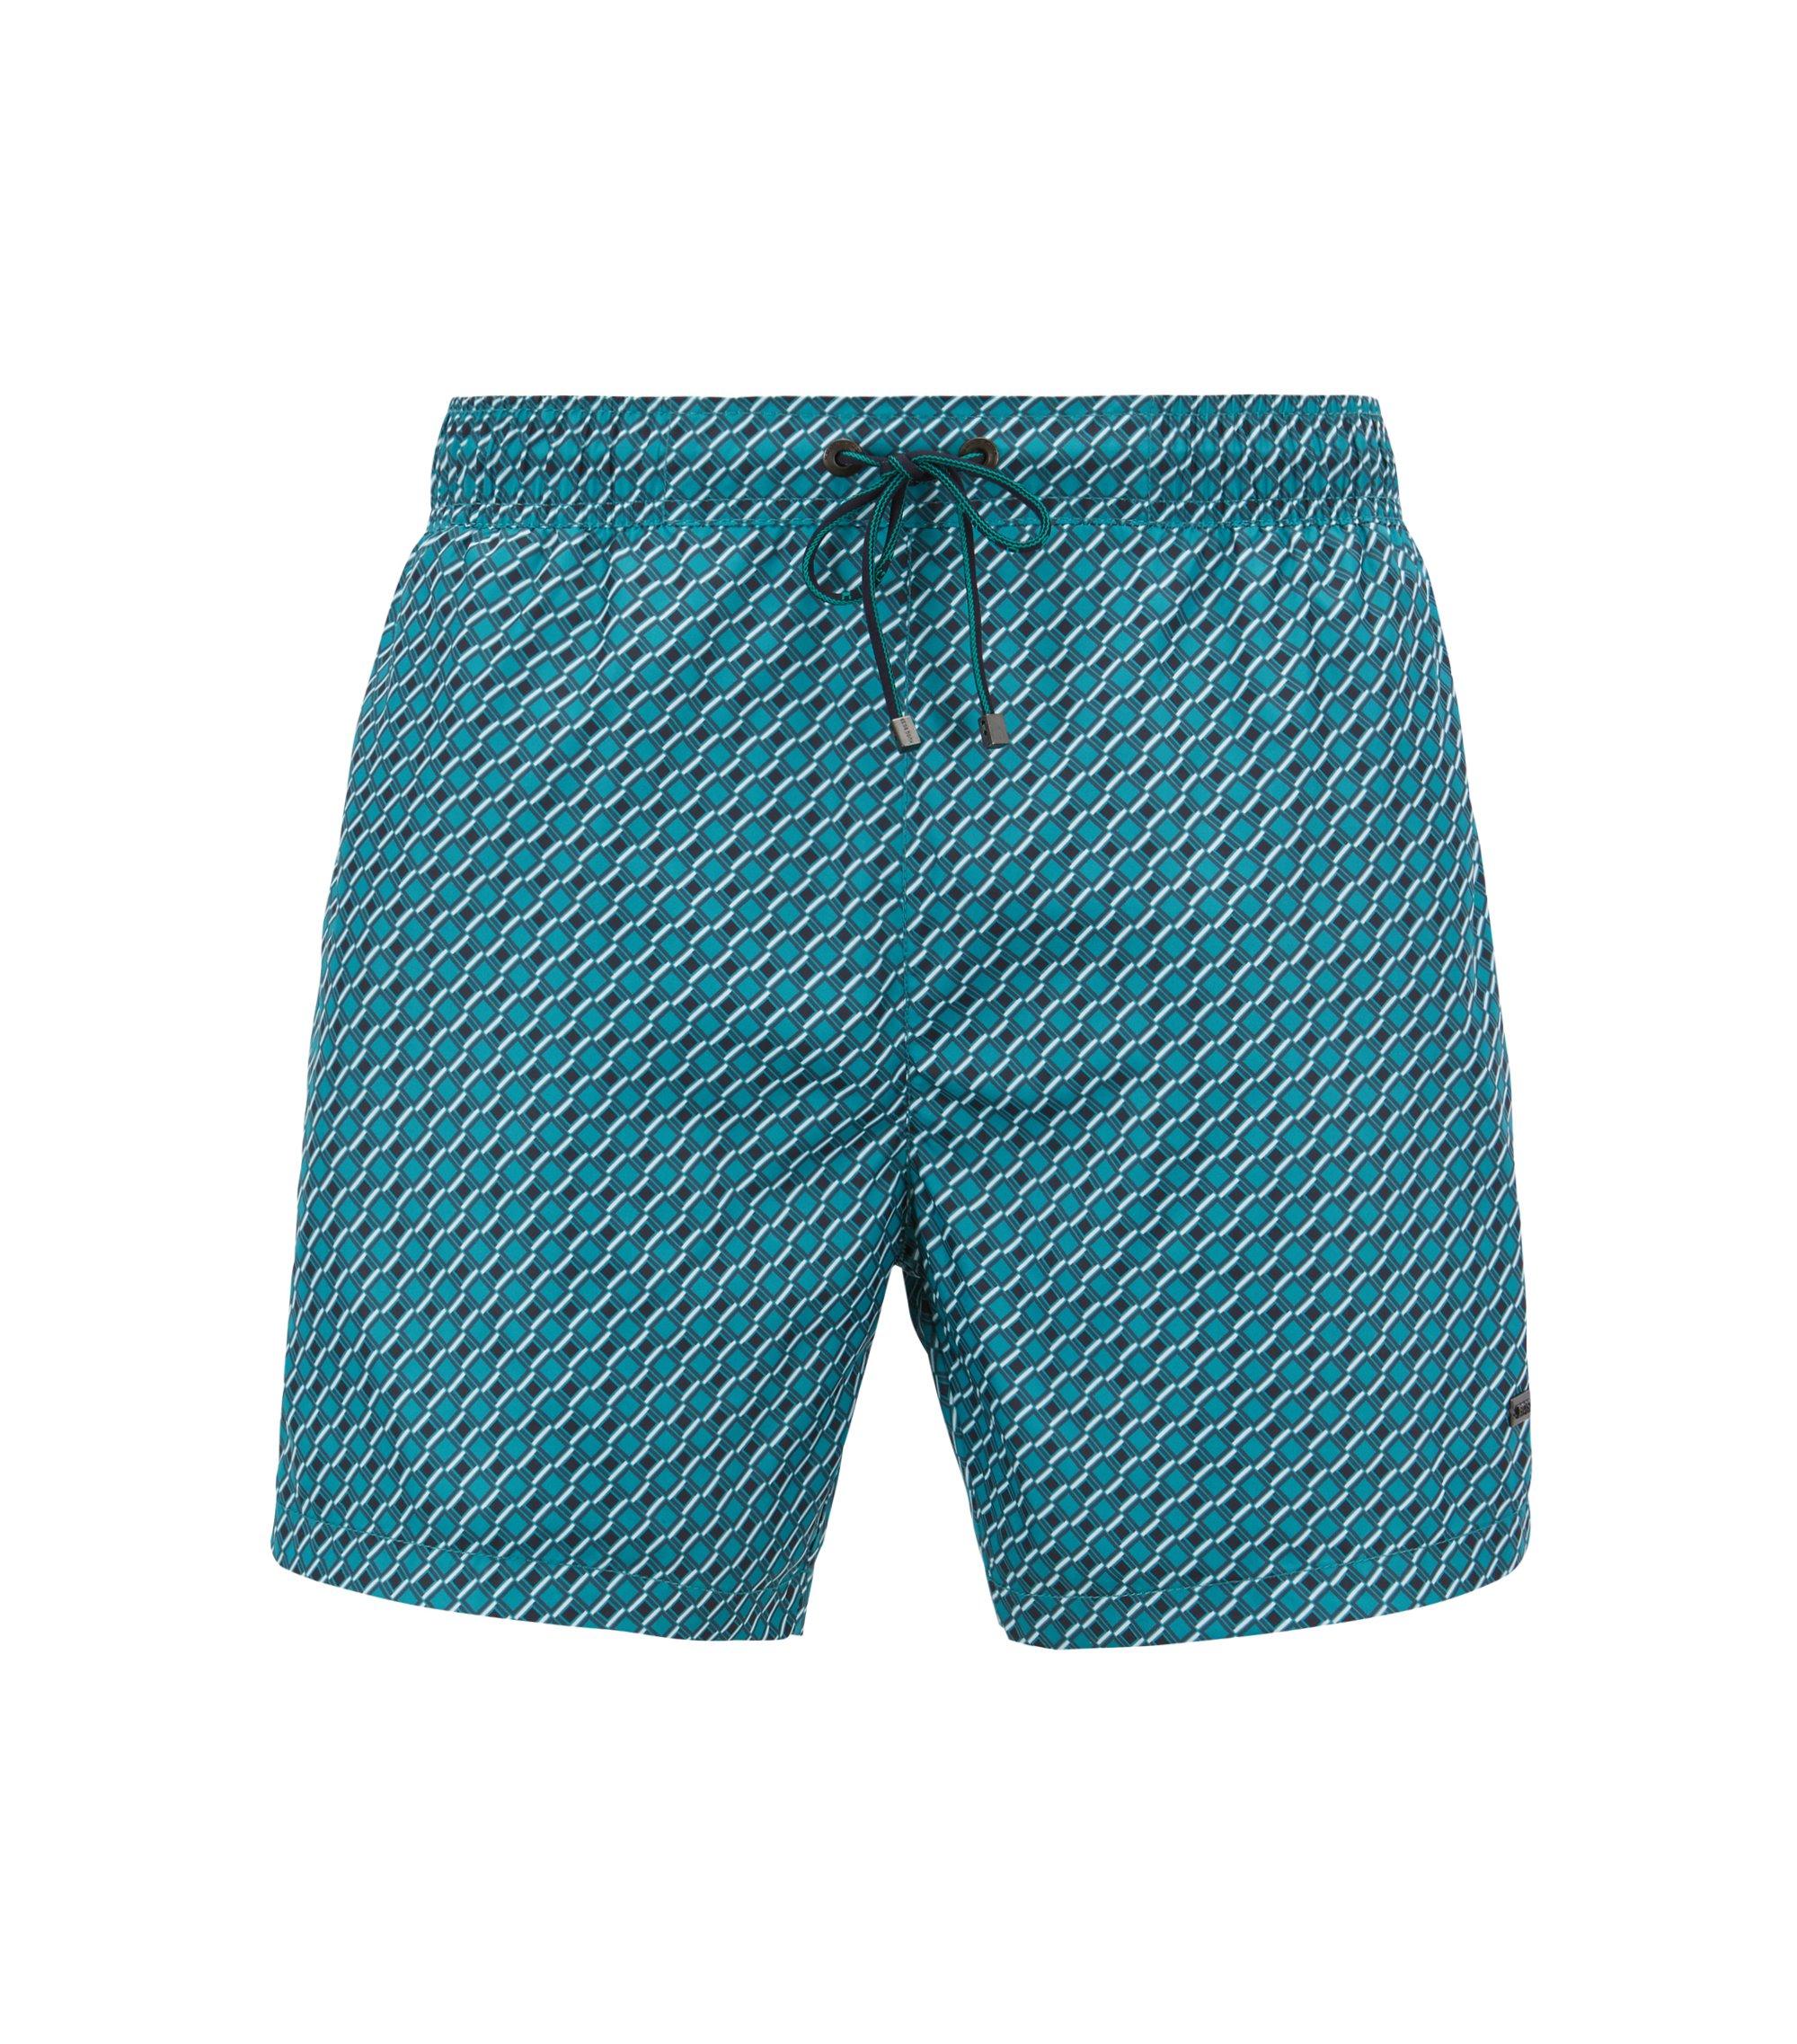 Lichte zwemshort met dessin en elastische tailleband, Groen